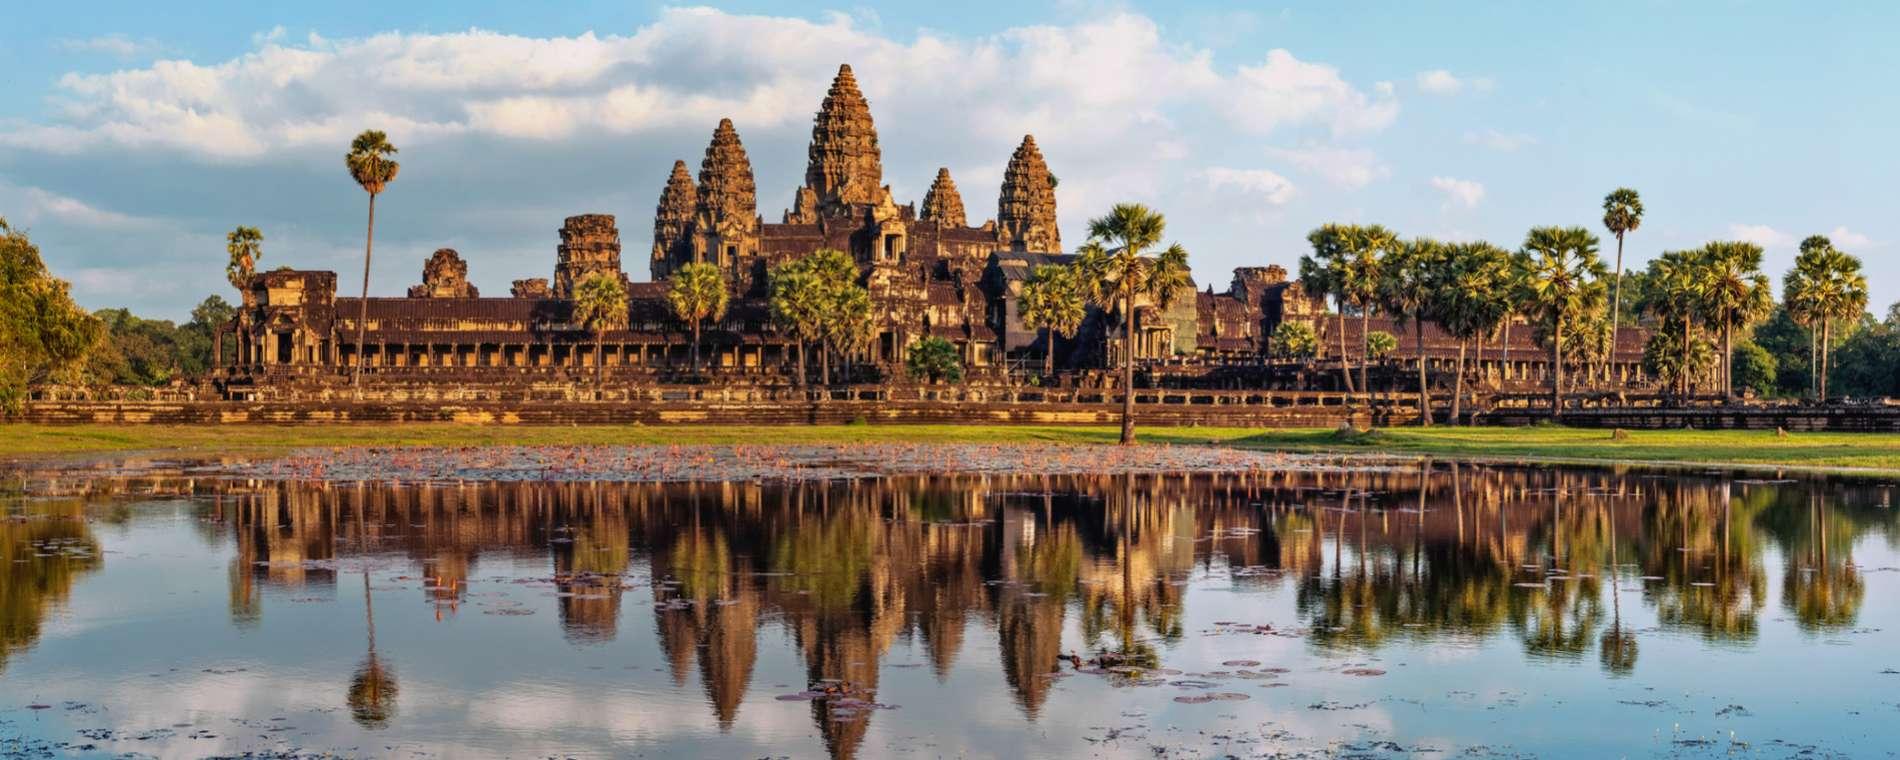 Храм Ангкор-Ват (Angkor Wat)